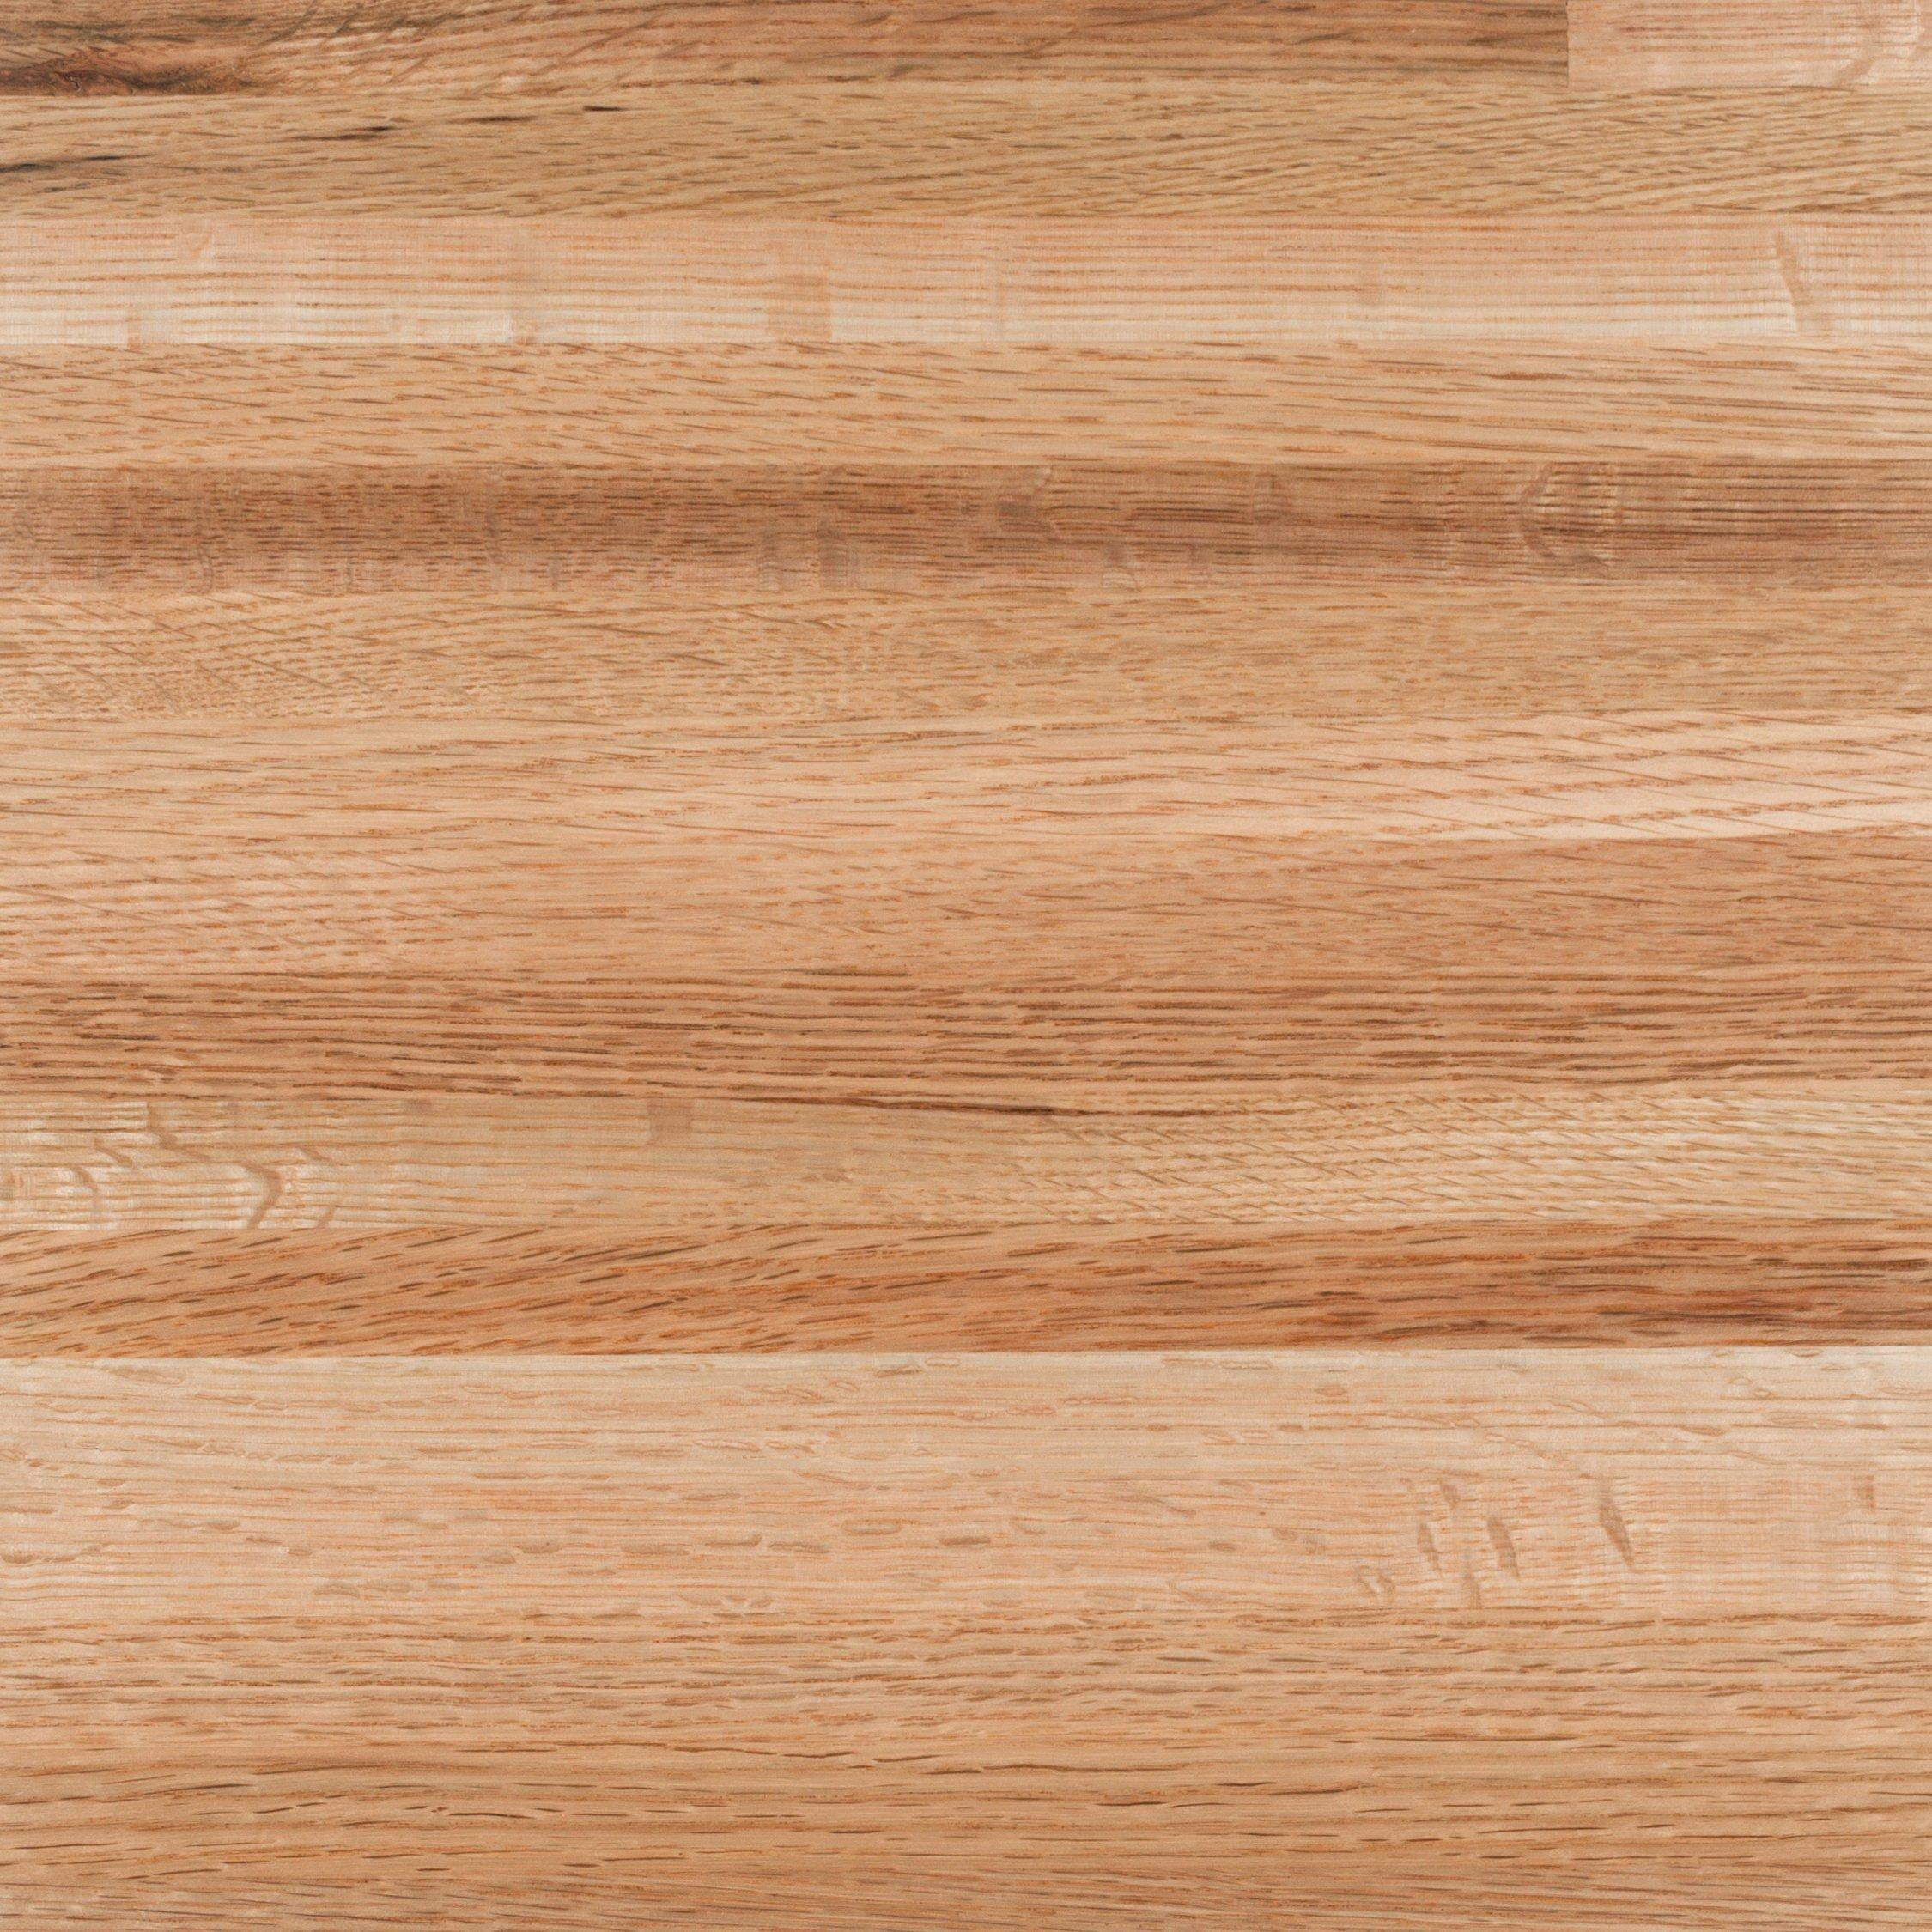 white oak butcher block countertop 8ft 96in x 25in 100020619 floor and decor. Black Bedroom Furniture Sets. Home Design Ideas